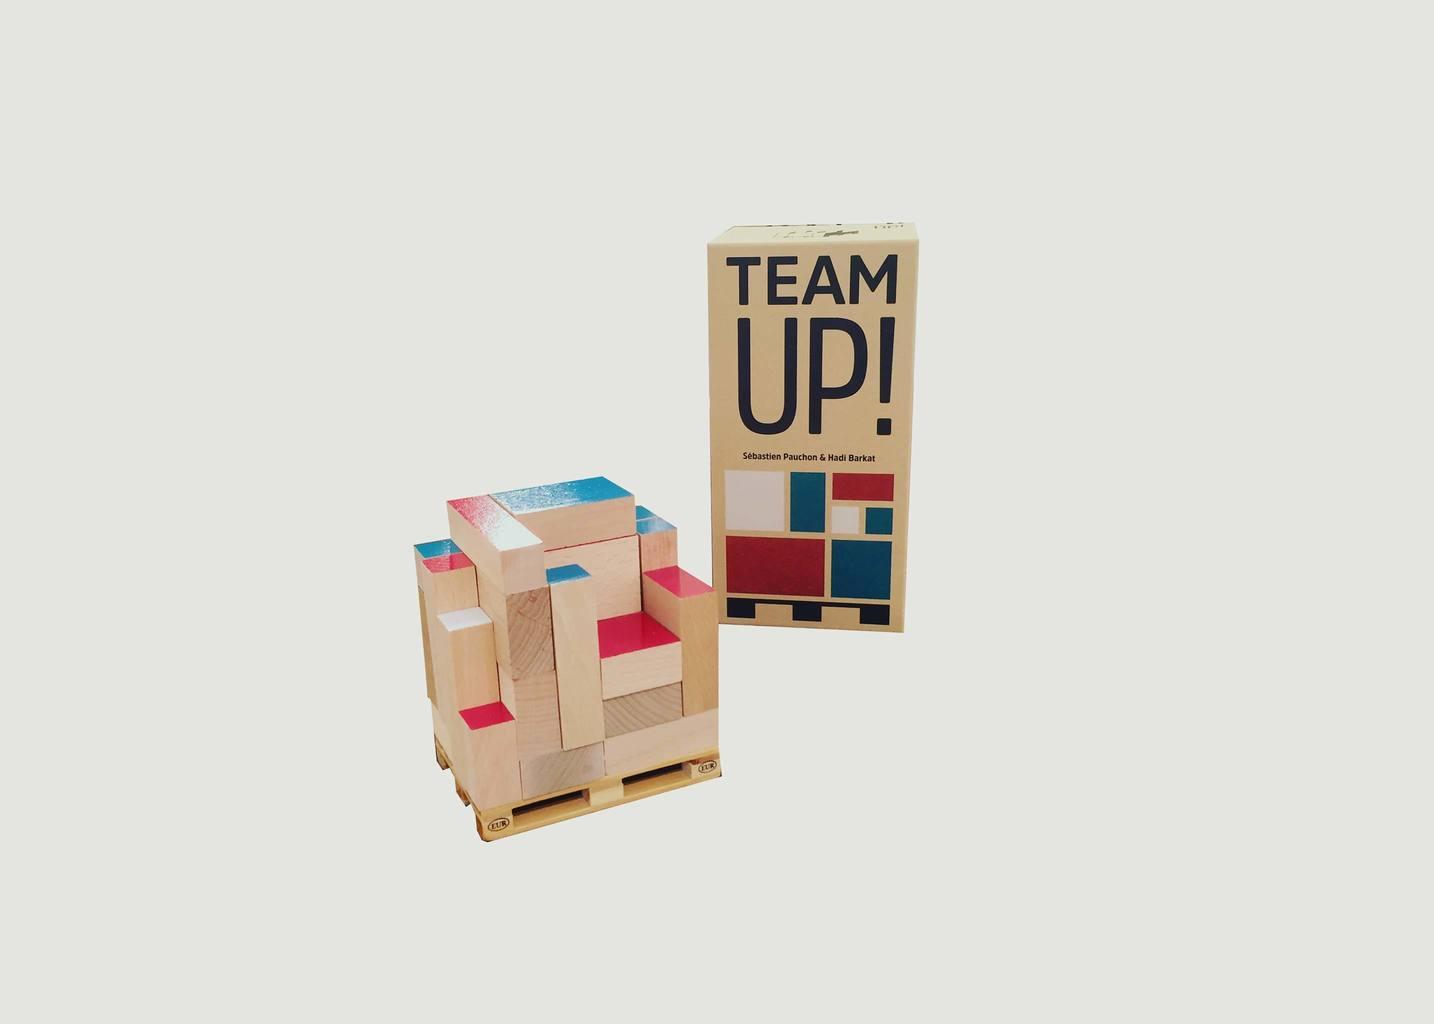 Jeu De Société Team Up ! - Helvetiq